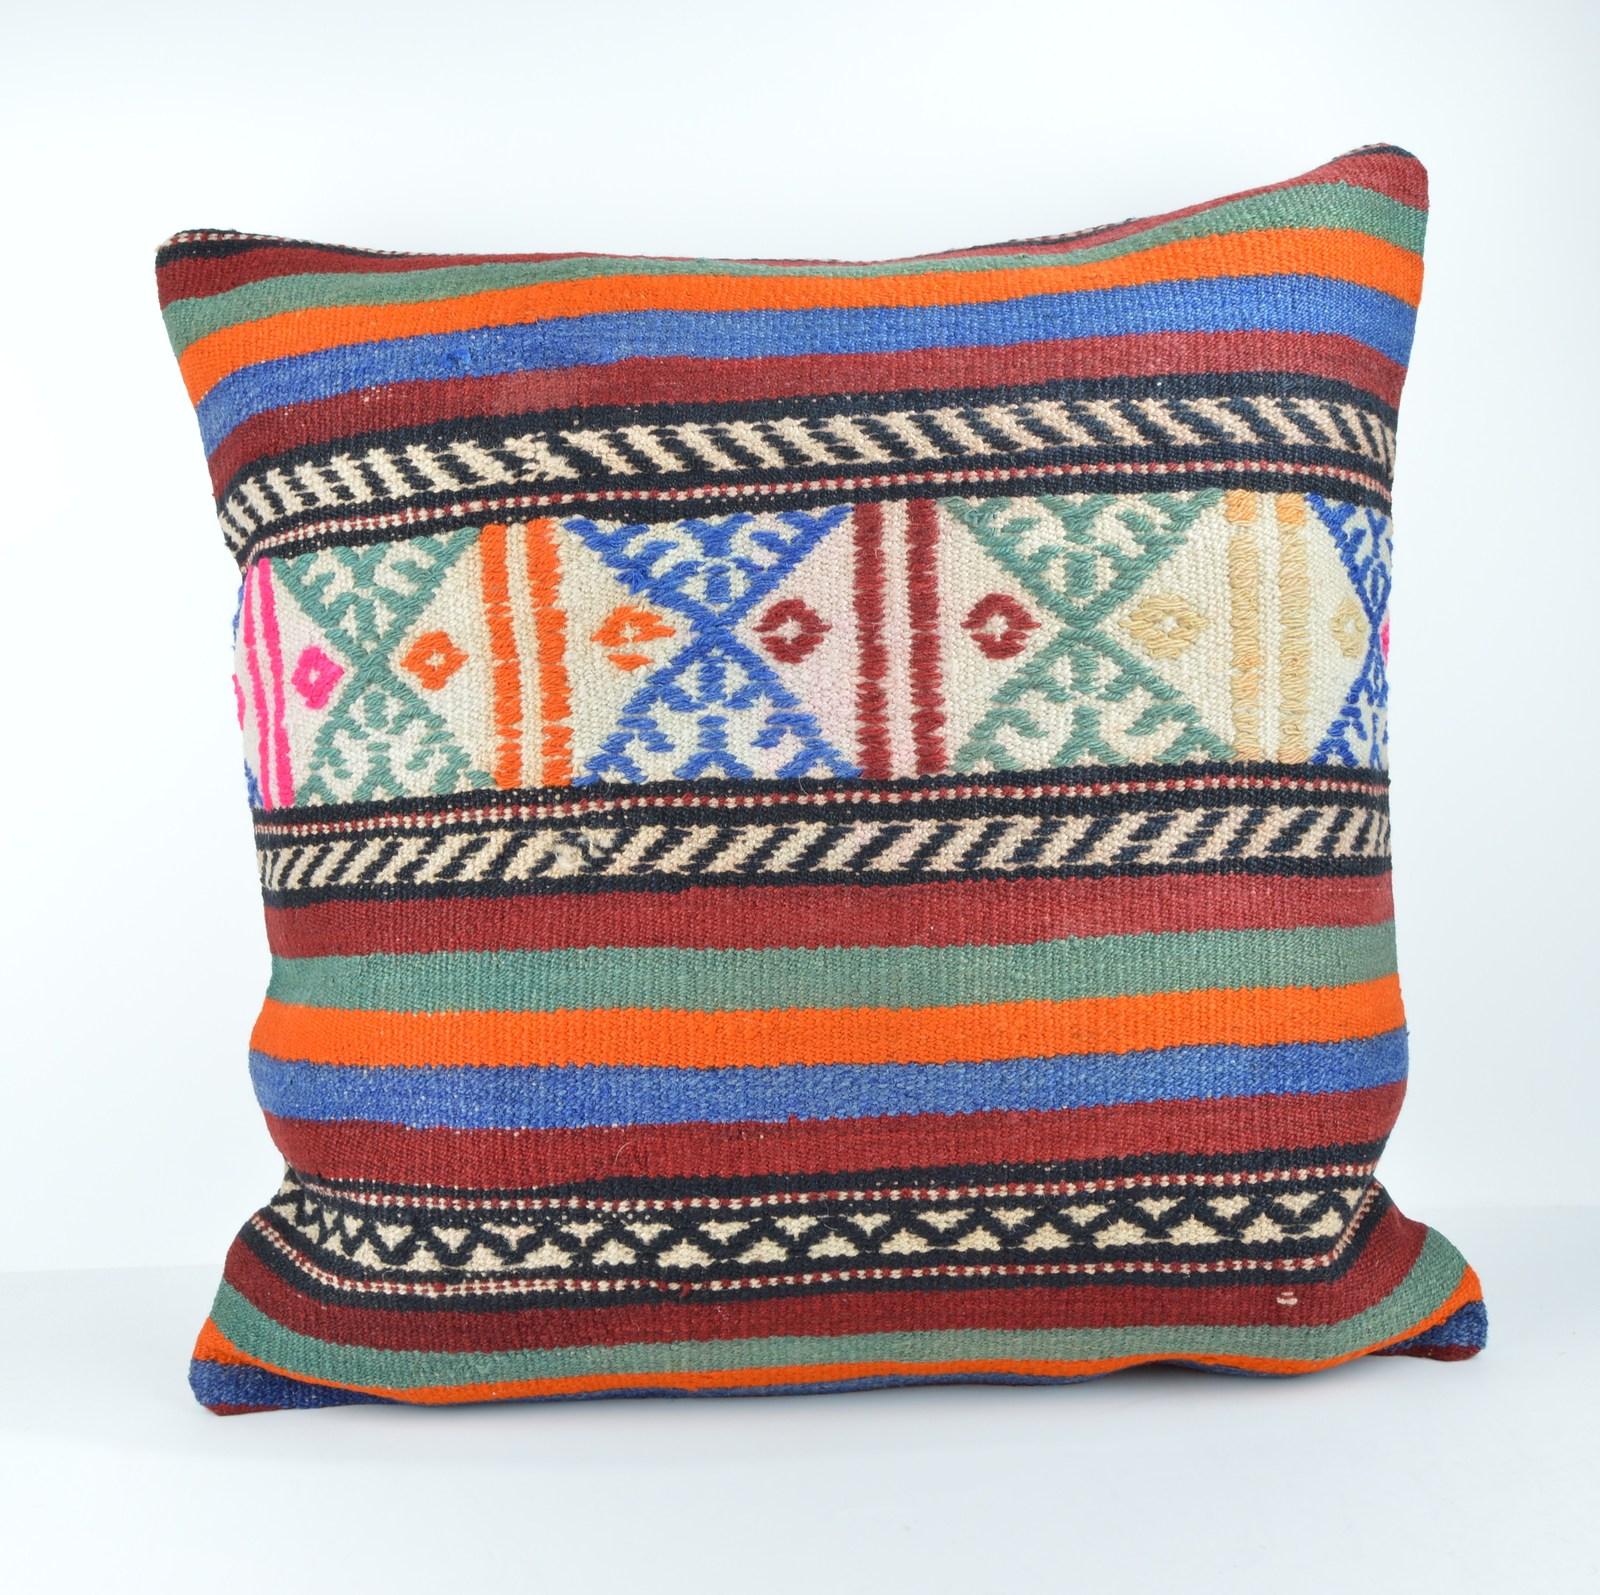 Large Throw Pillow Cases : 24x24 large pillow big pillow decorative pillow case large cushion 60x60cm - Pillows